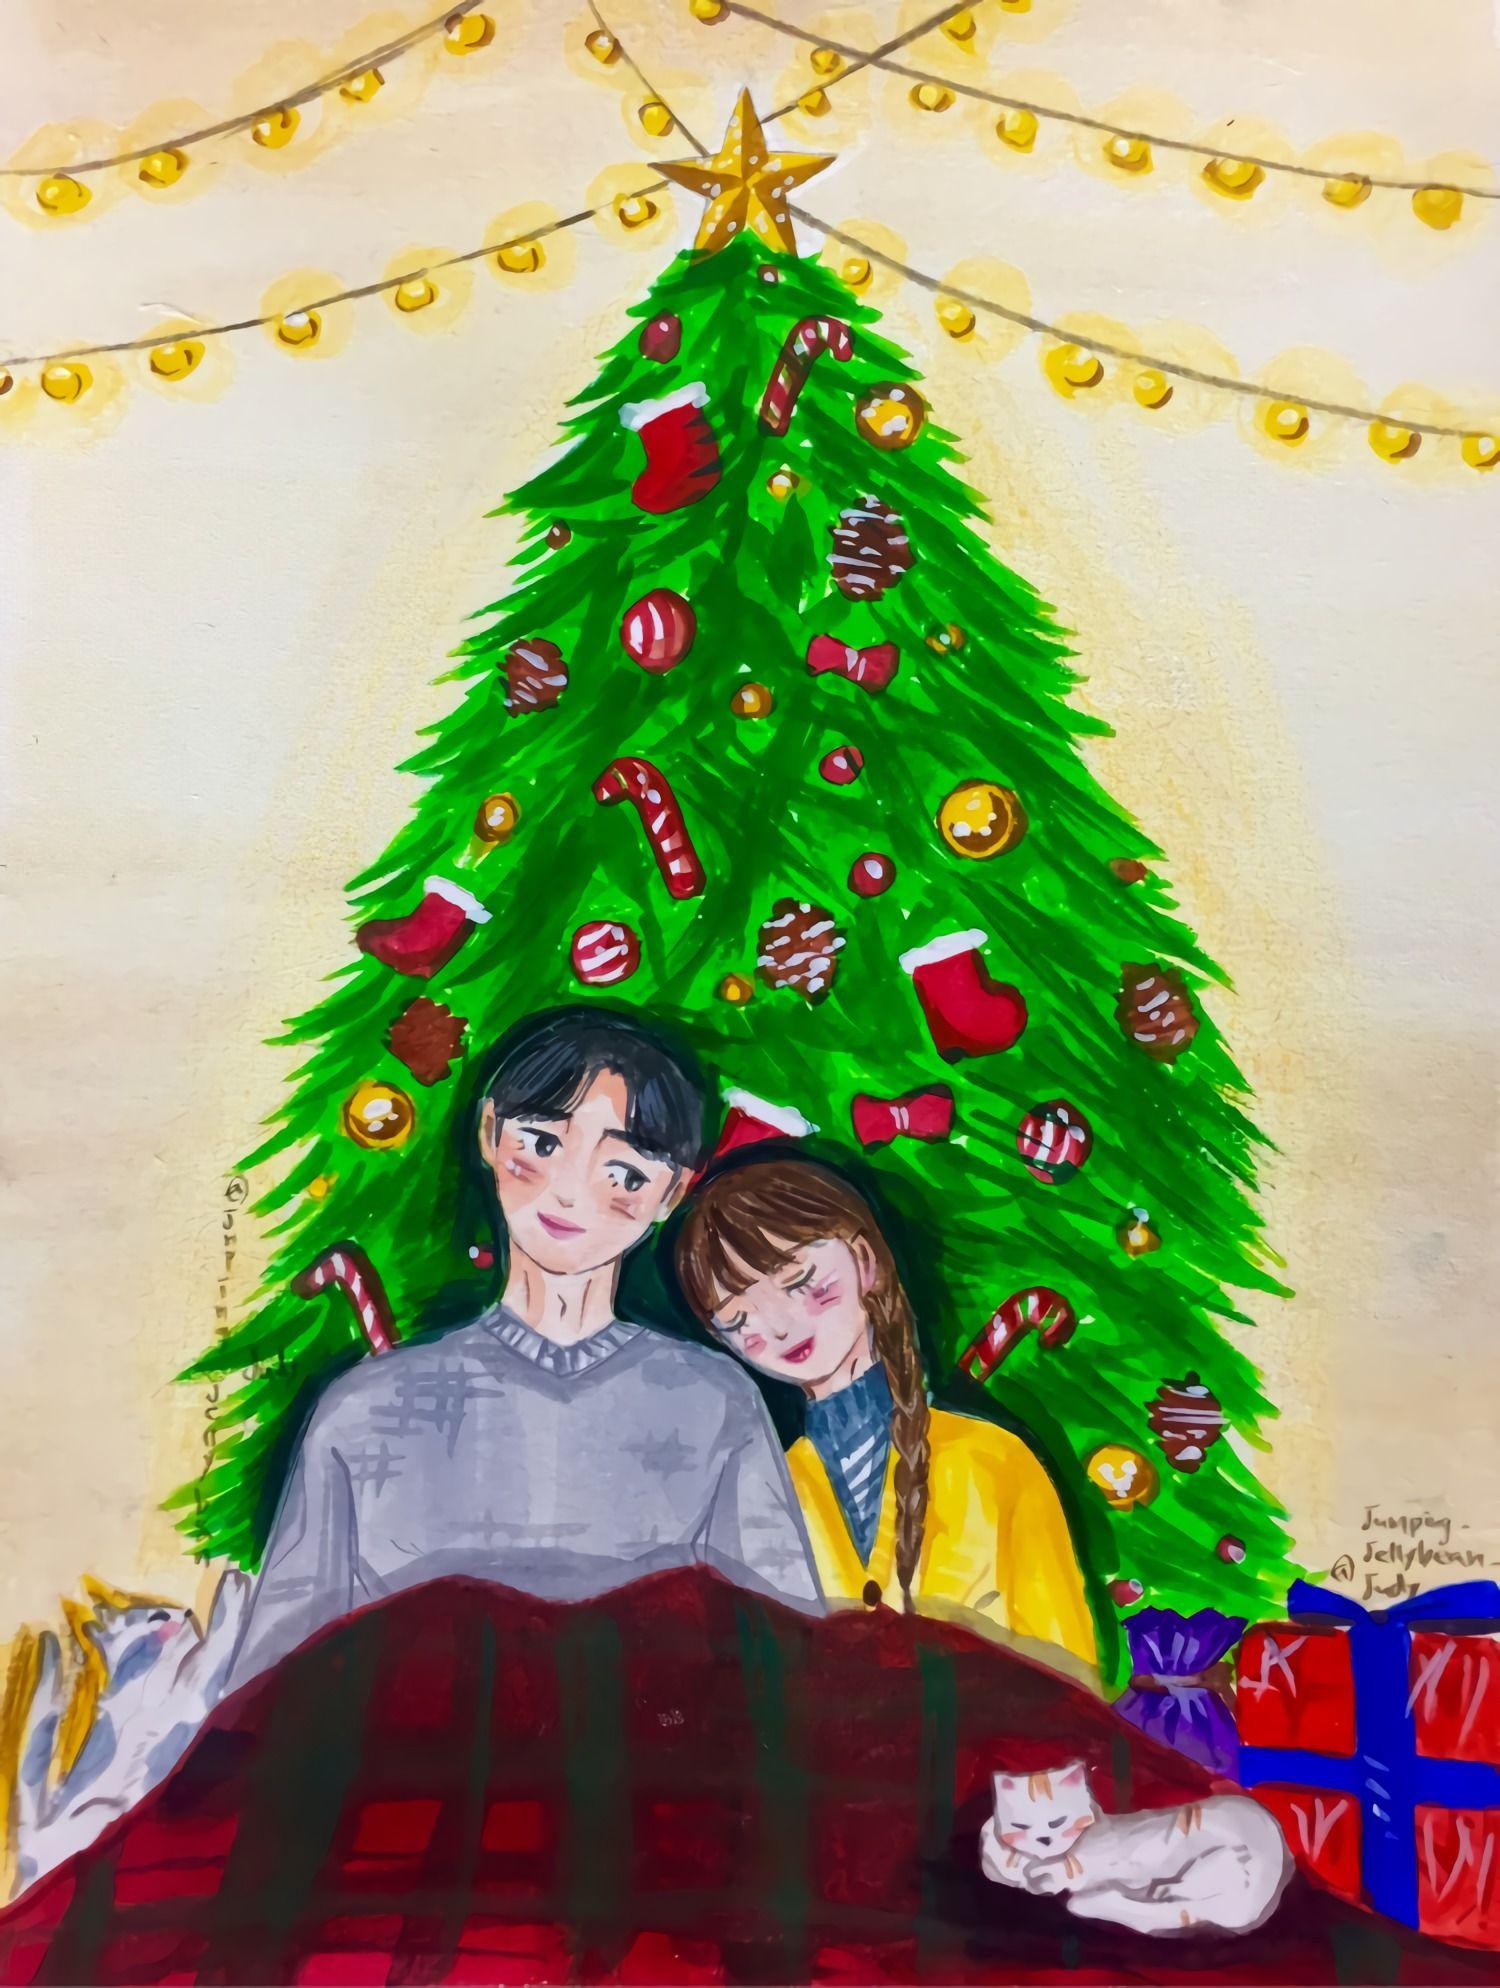 Merry Christmas 메리 크리스마스 크리스마스 사랑 크리스마스 메리 크리스마스